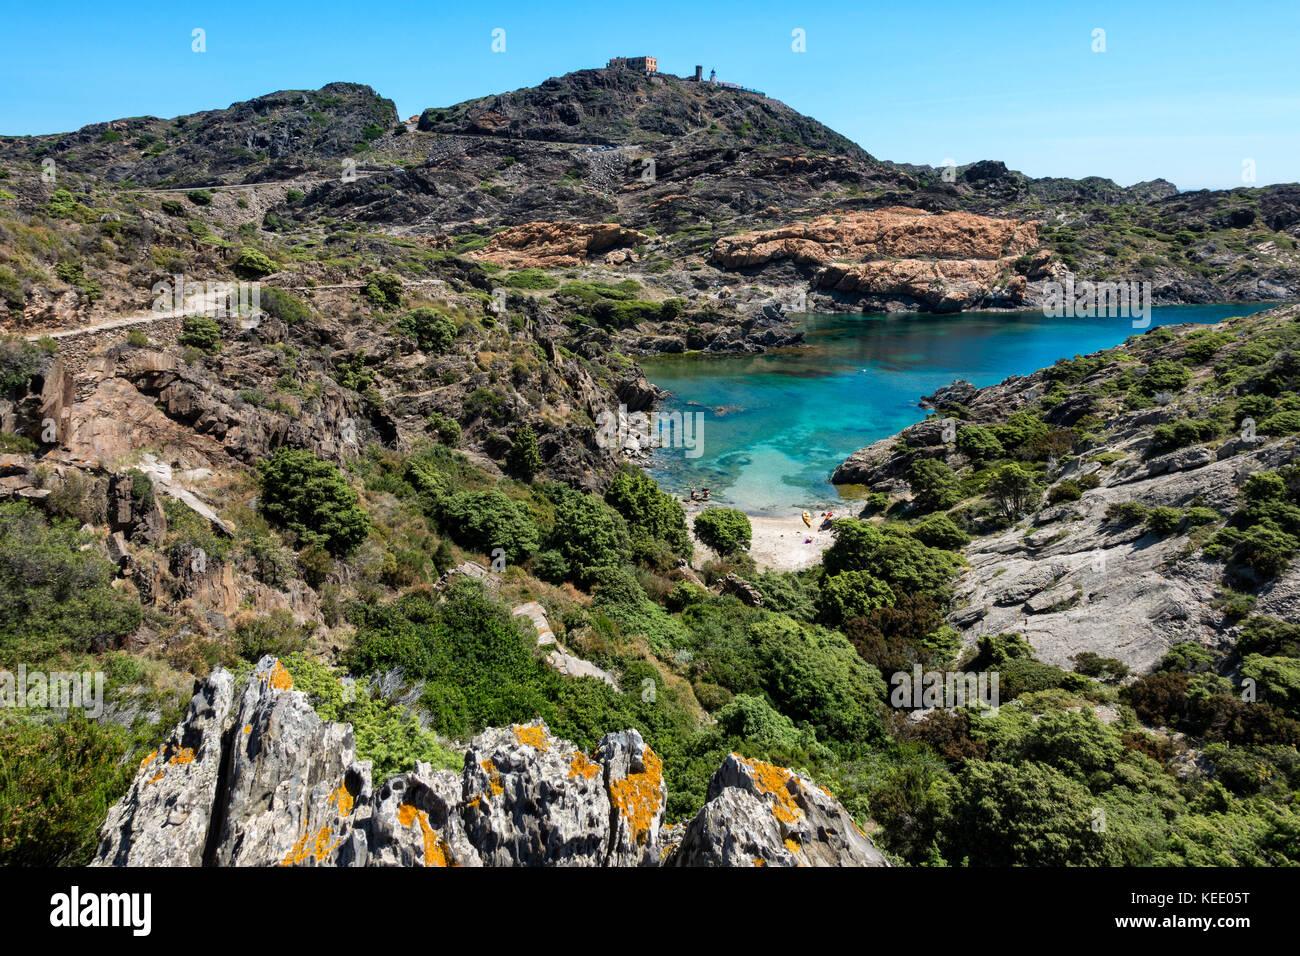 Cap de Creus Natural Park.Gerona Province.Catalunya.Spain - Stock Image